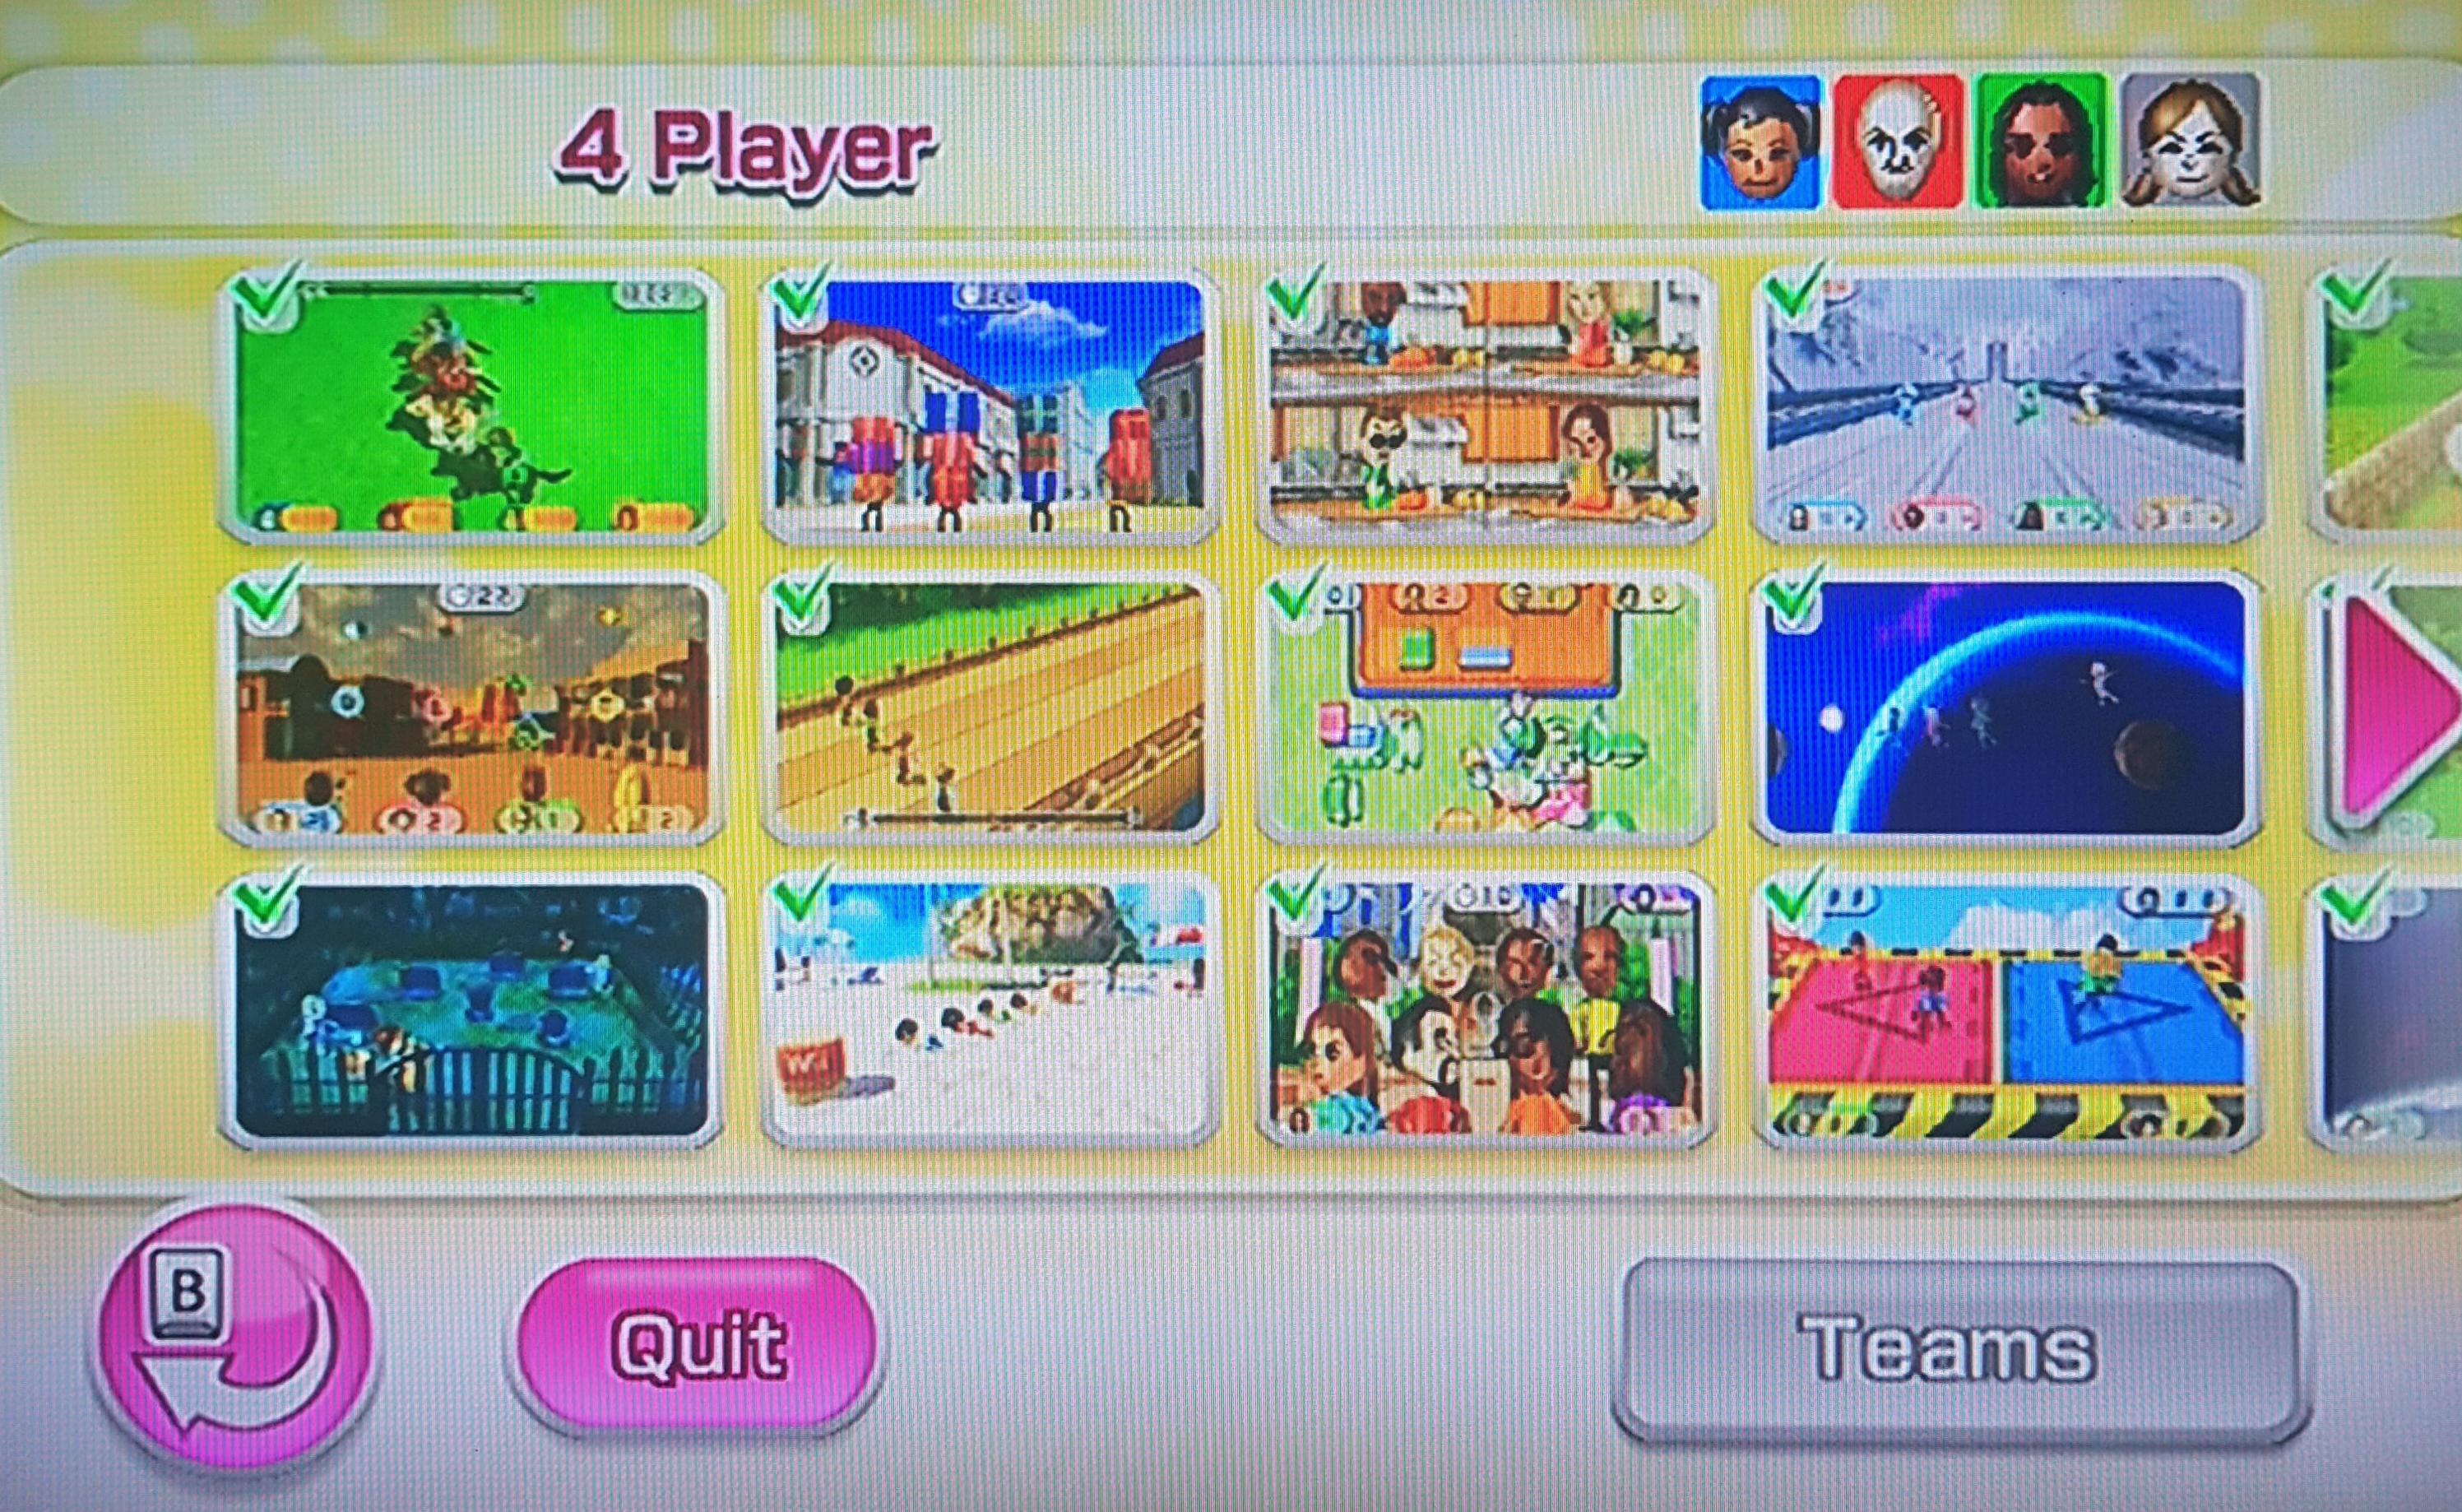 4-player minigame